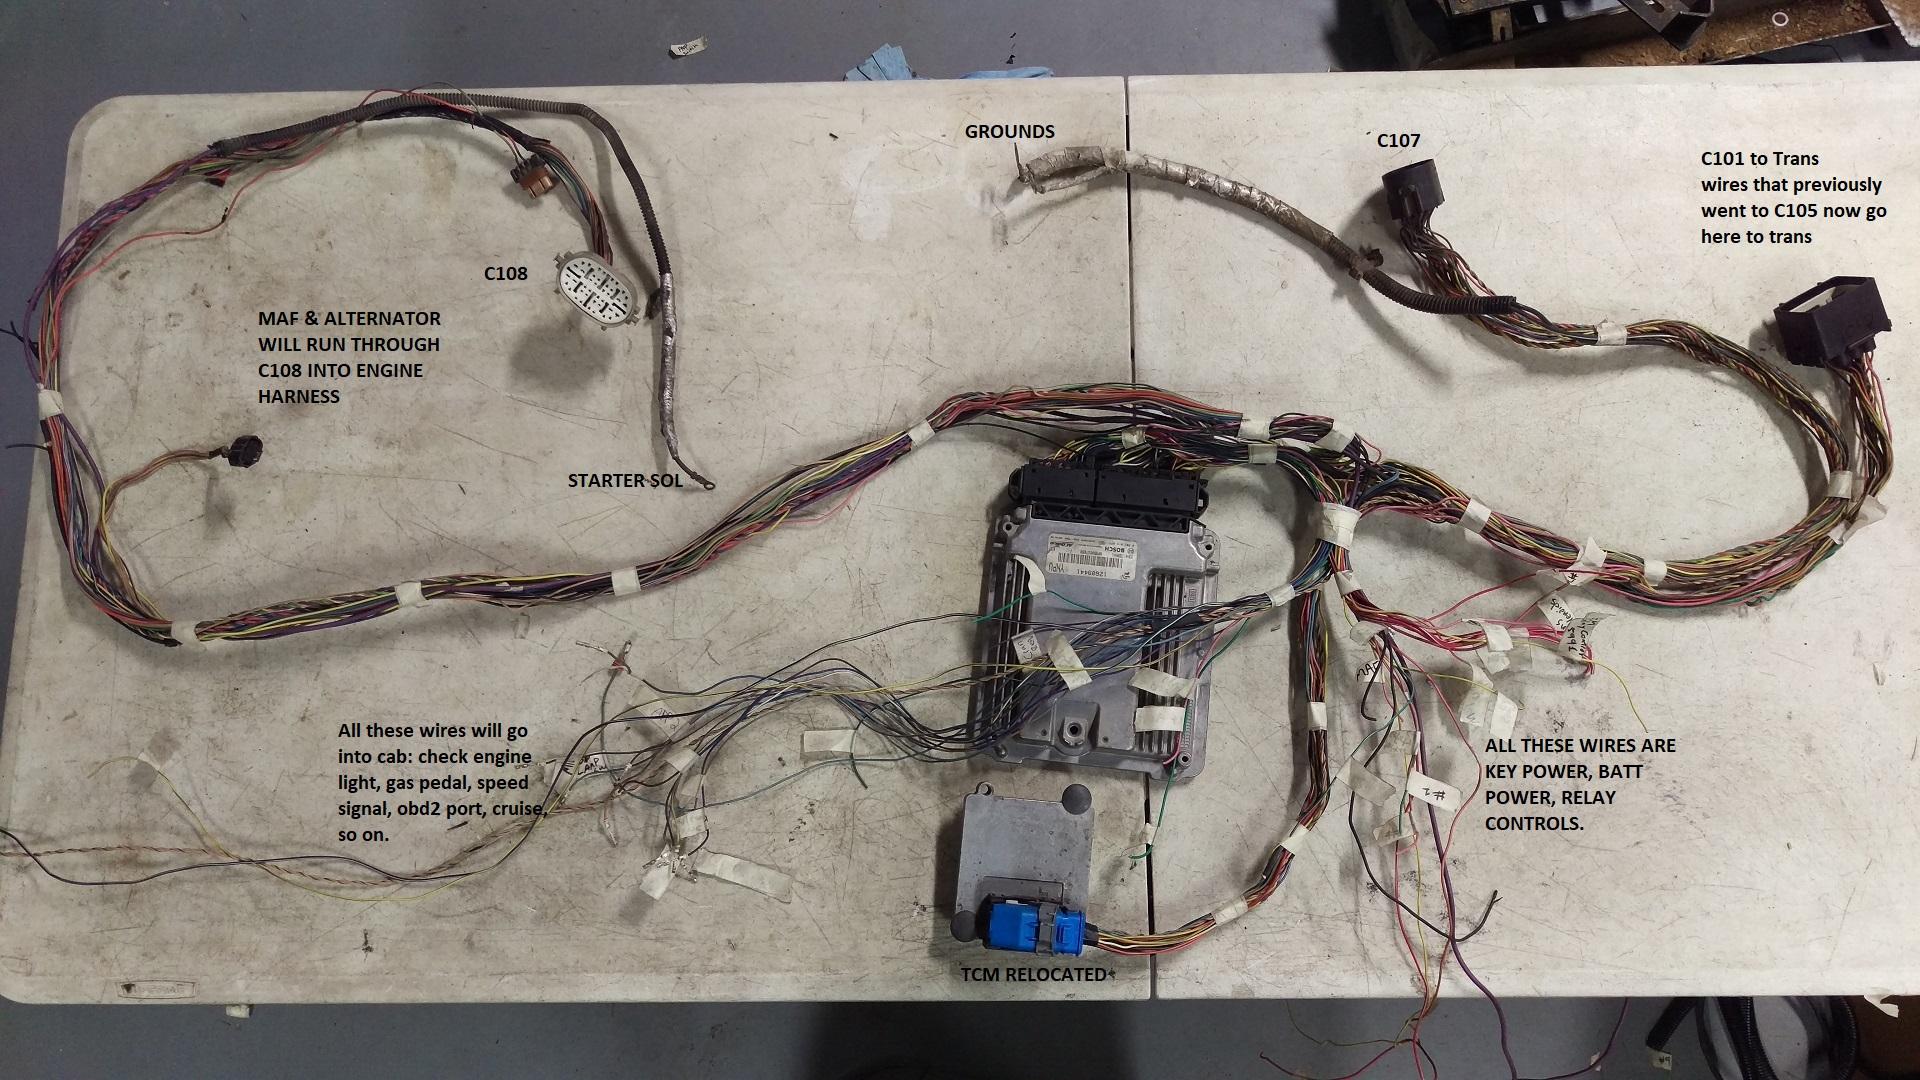 [DIAGRAM_3US]  SK_0337] 2005 Duramax Wiring Harness Wiring Diagram   Lb7 Tcm Wiring Diagram      Erbug Heeve Mohammedshrine Librar Wiring 101